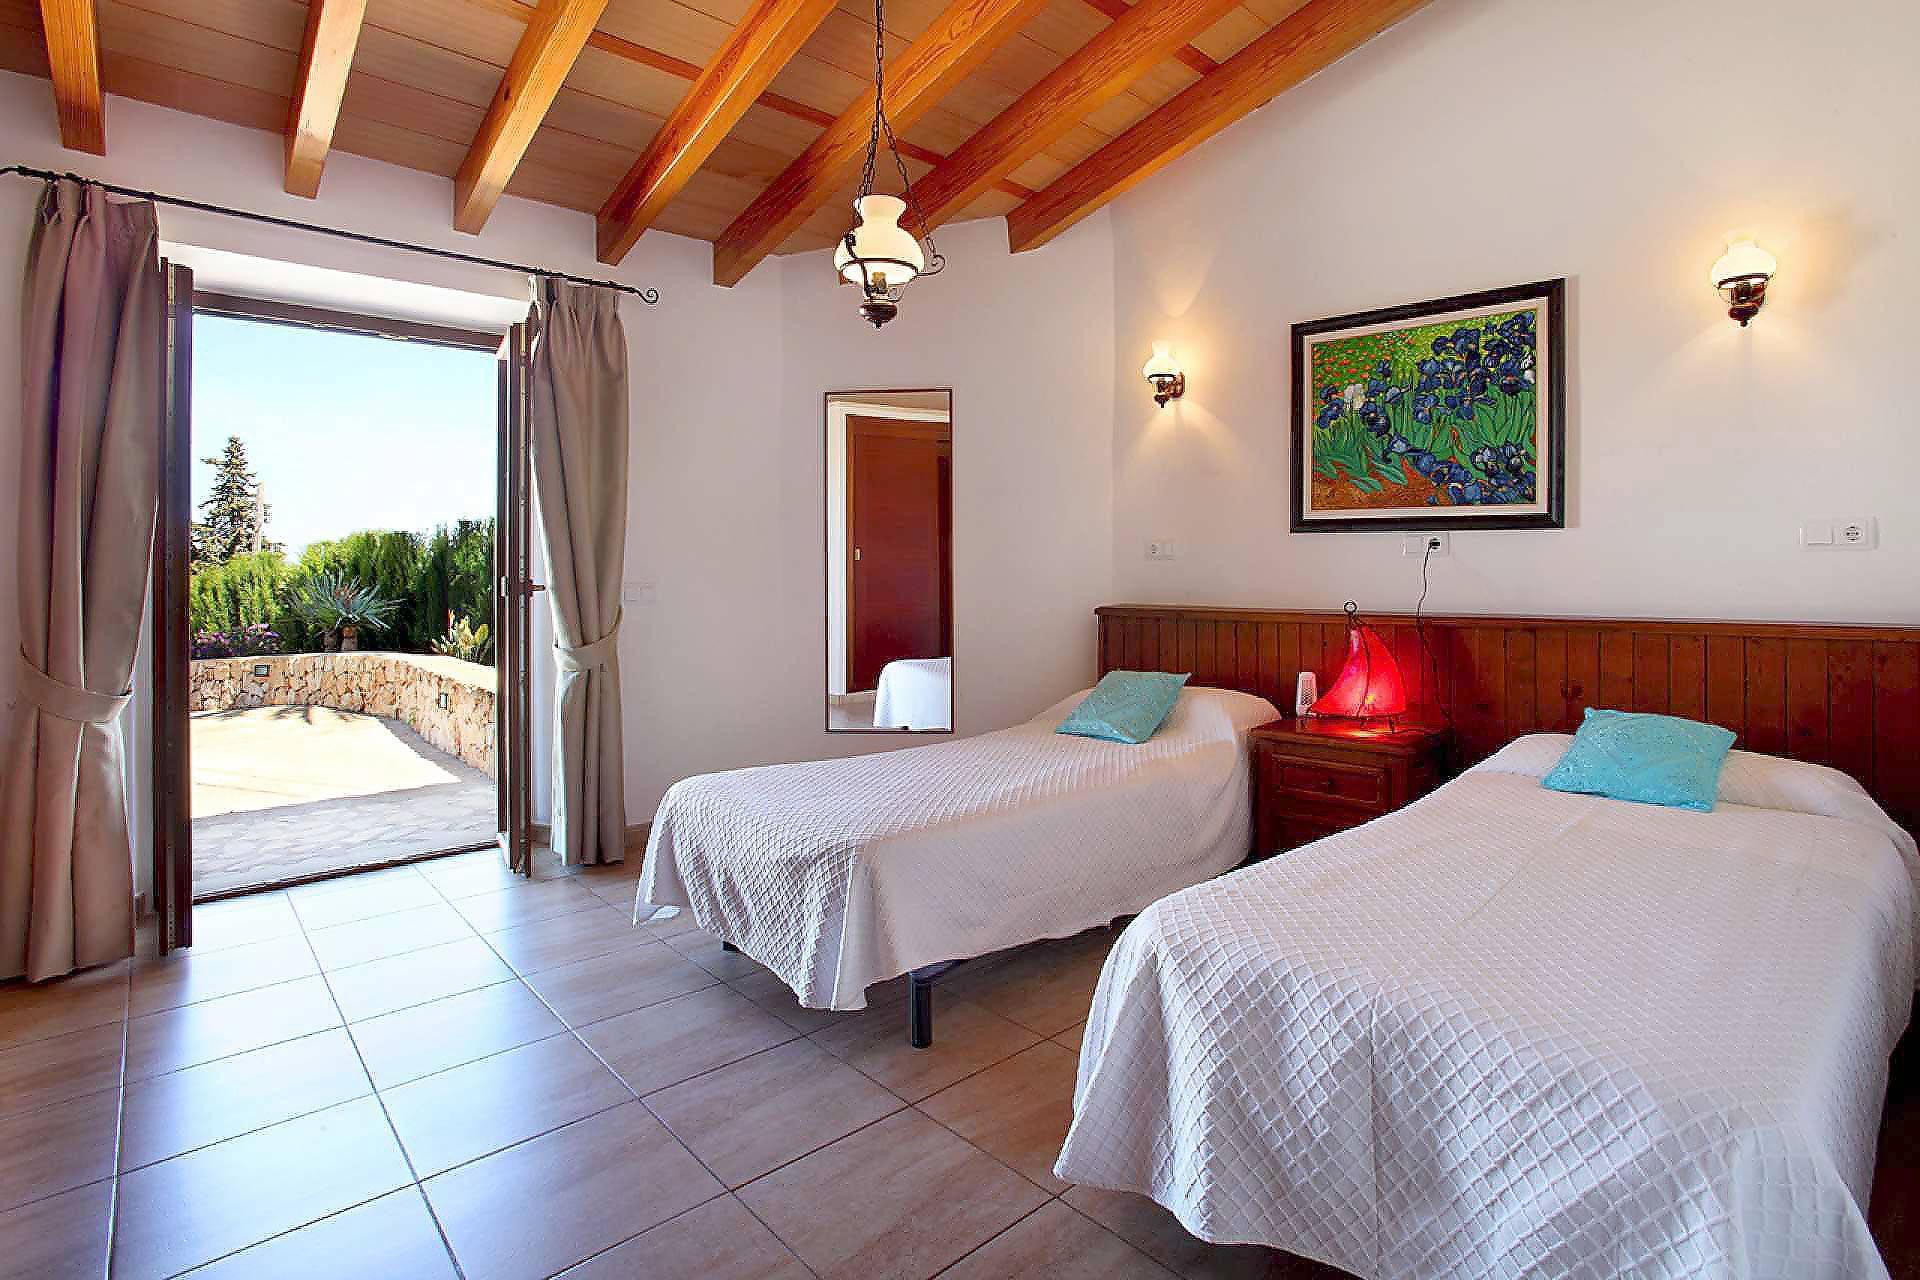 01-33 Spacious holiday home Mallorca East Bild 24